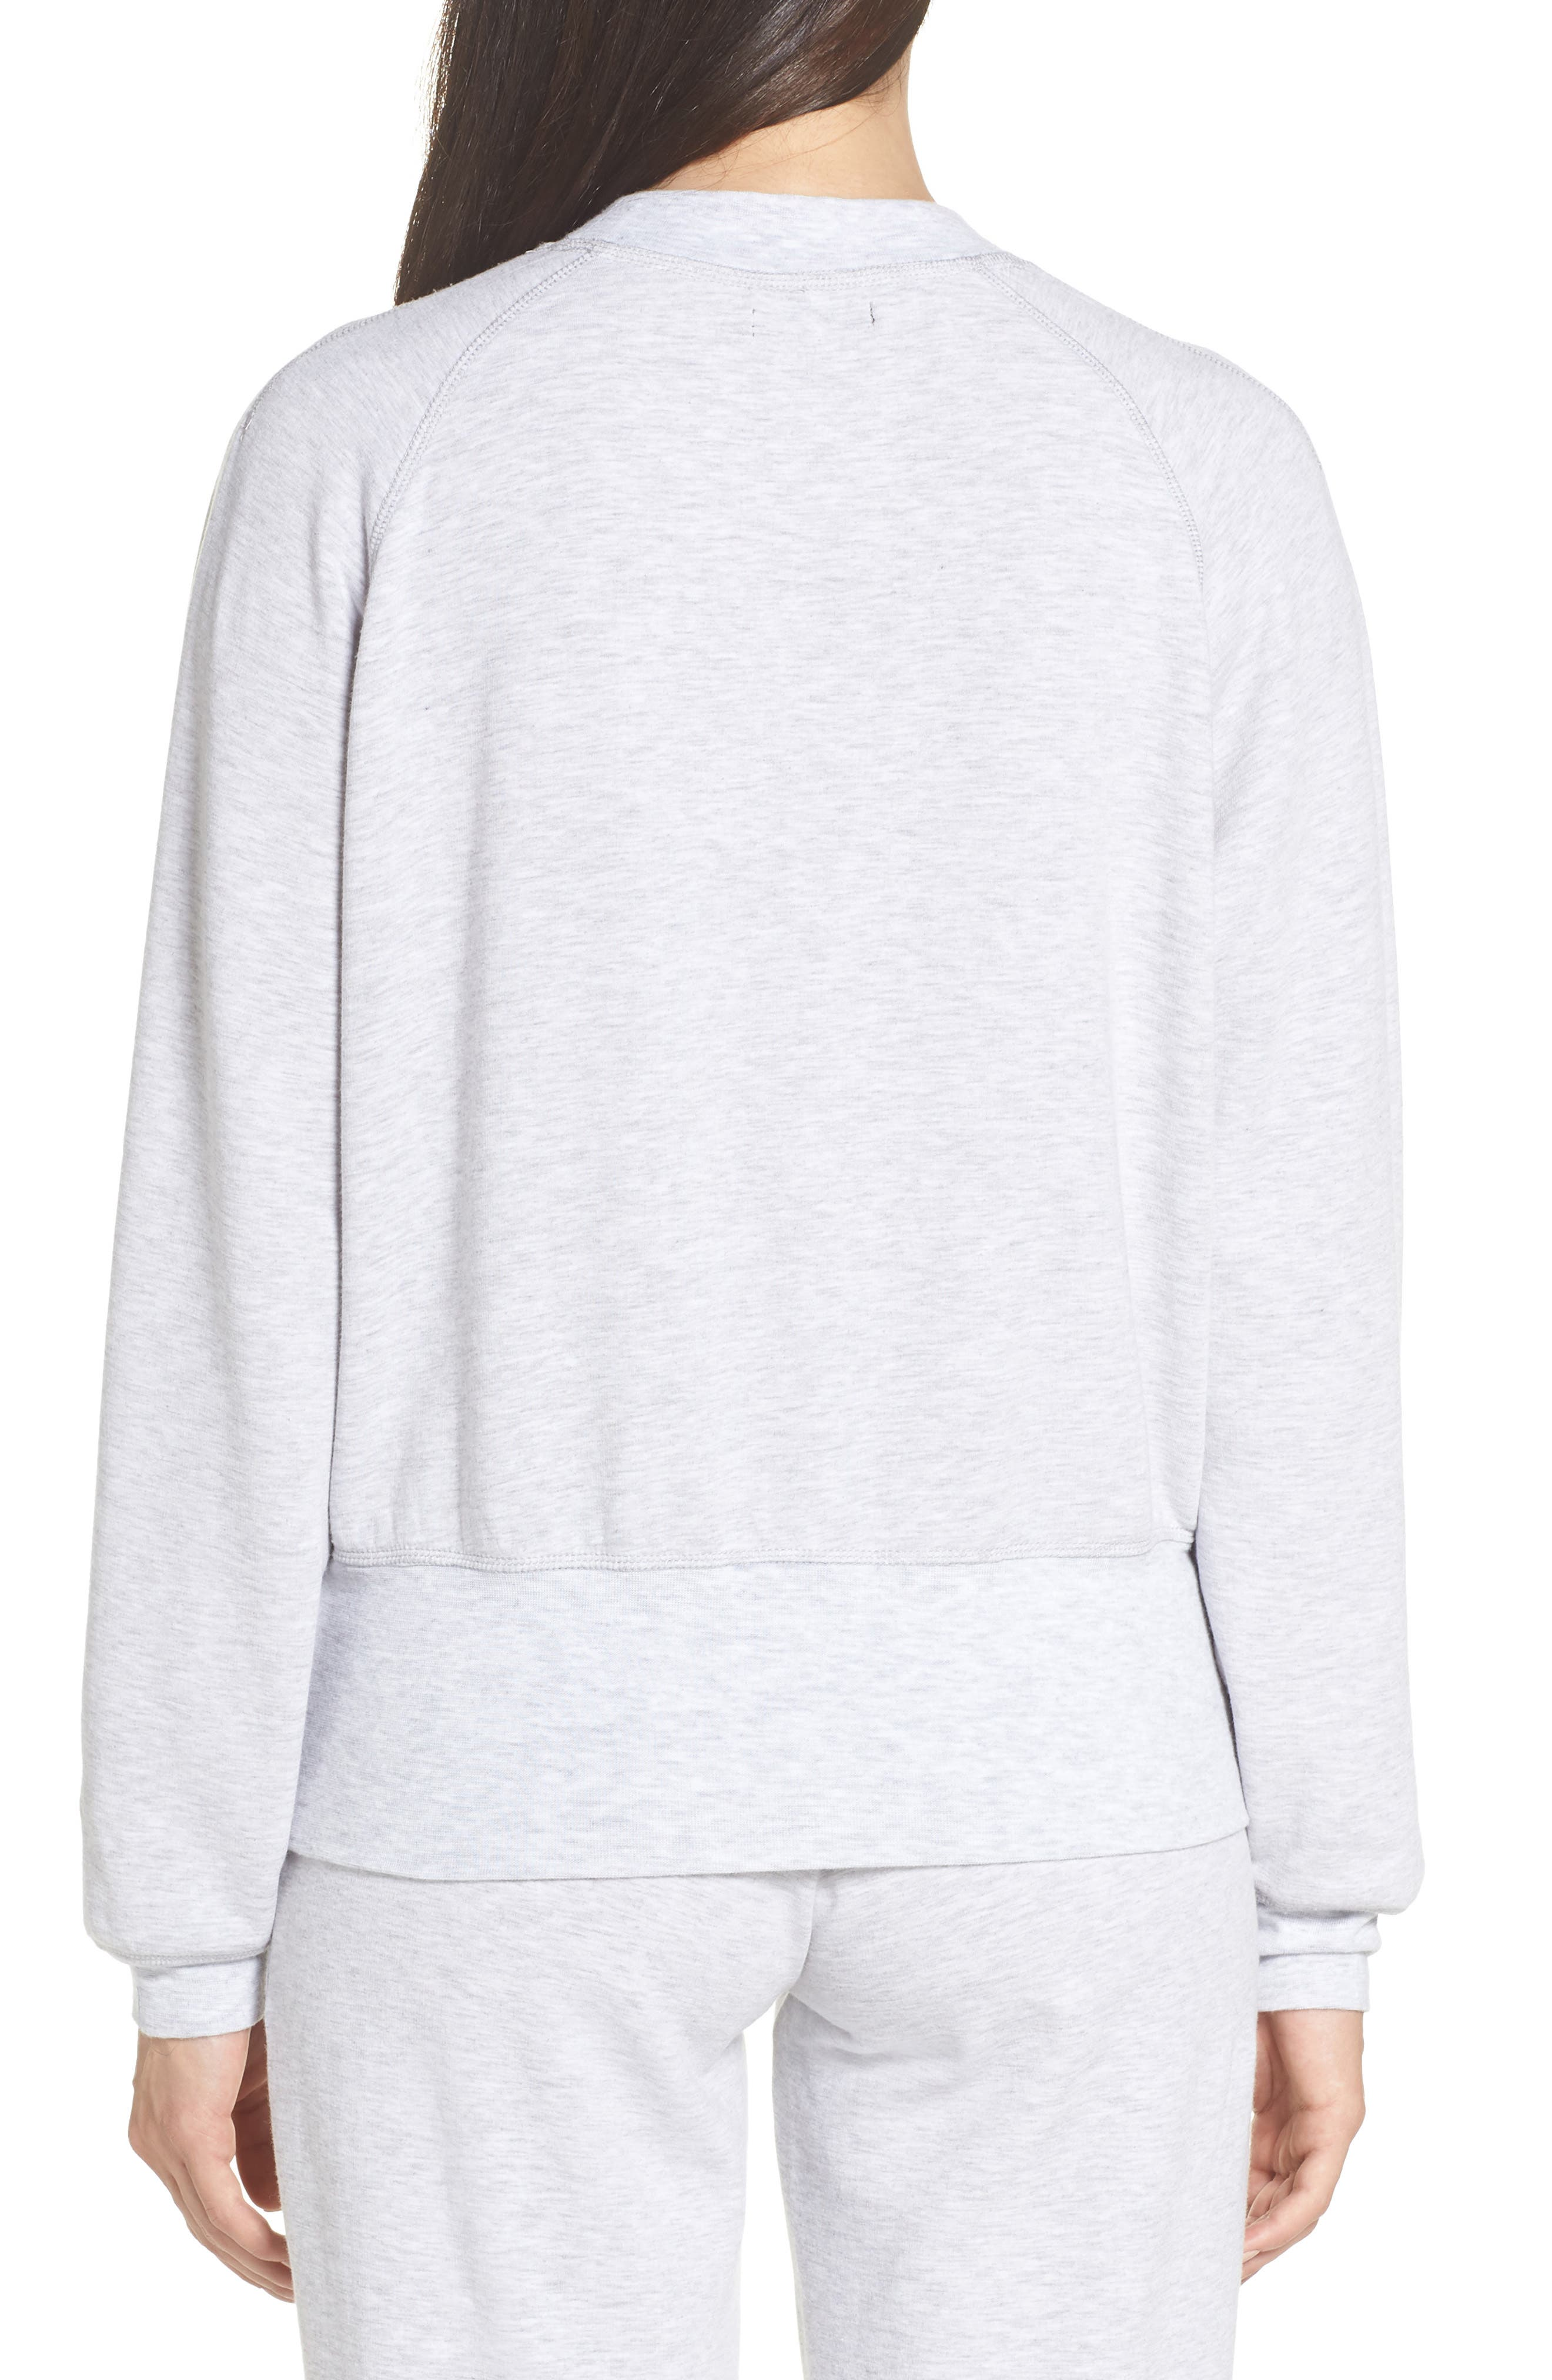 Cool Touch Sweatshirt,                             Alternate thumbnail 2, color,                             020